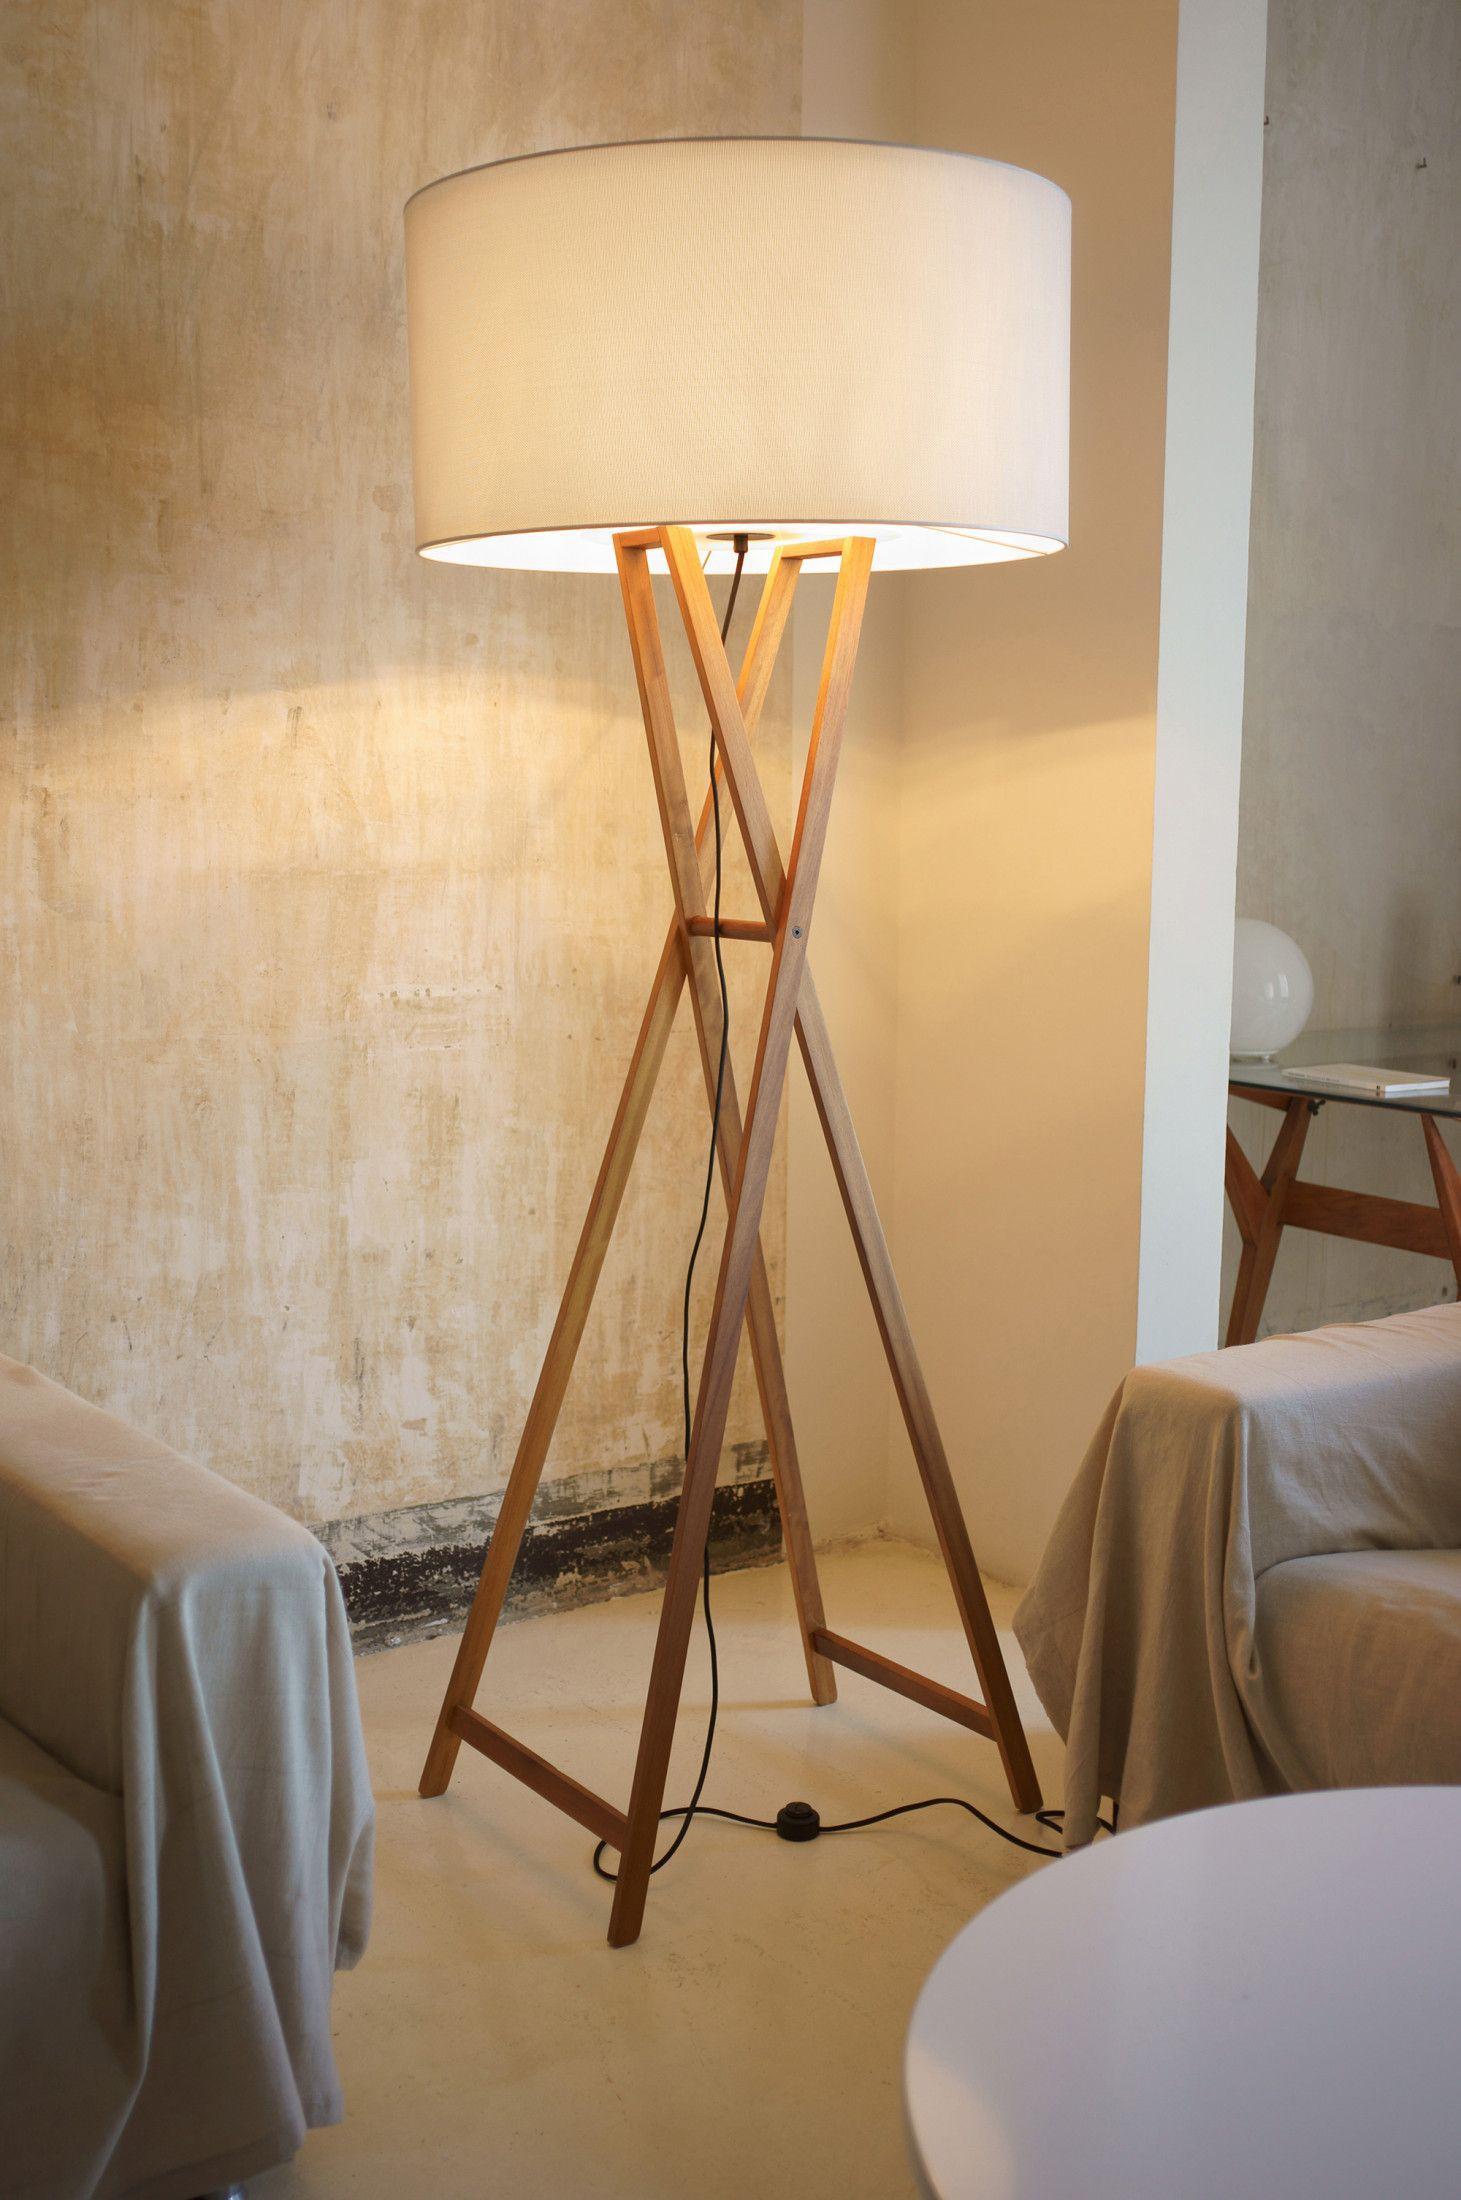 Marset Floor Lamps Design Light Lighting Usa Cala Marset Usa Indoor Floor Lamps Floor Lamp Lamp Decor